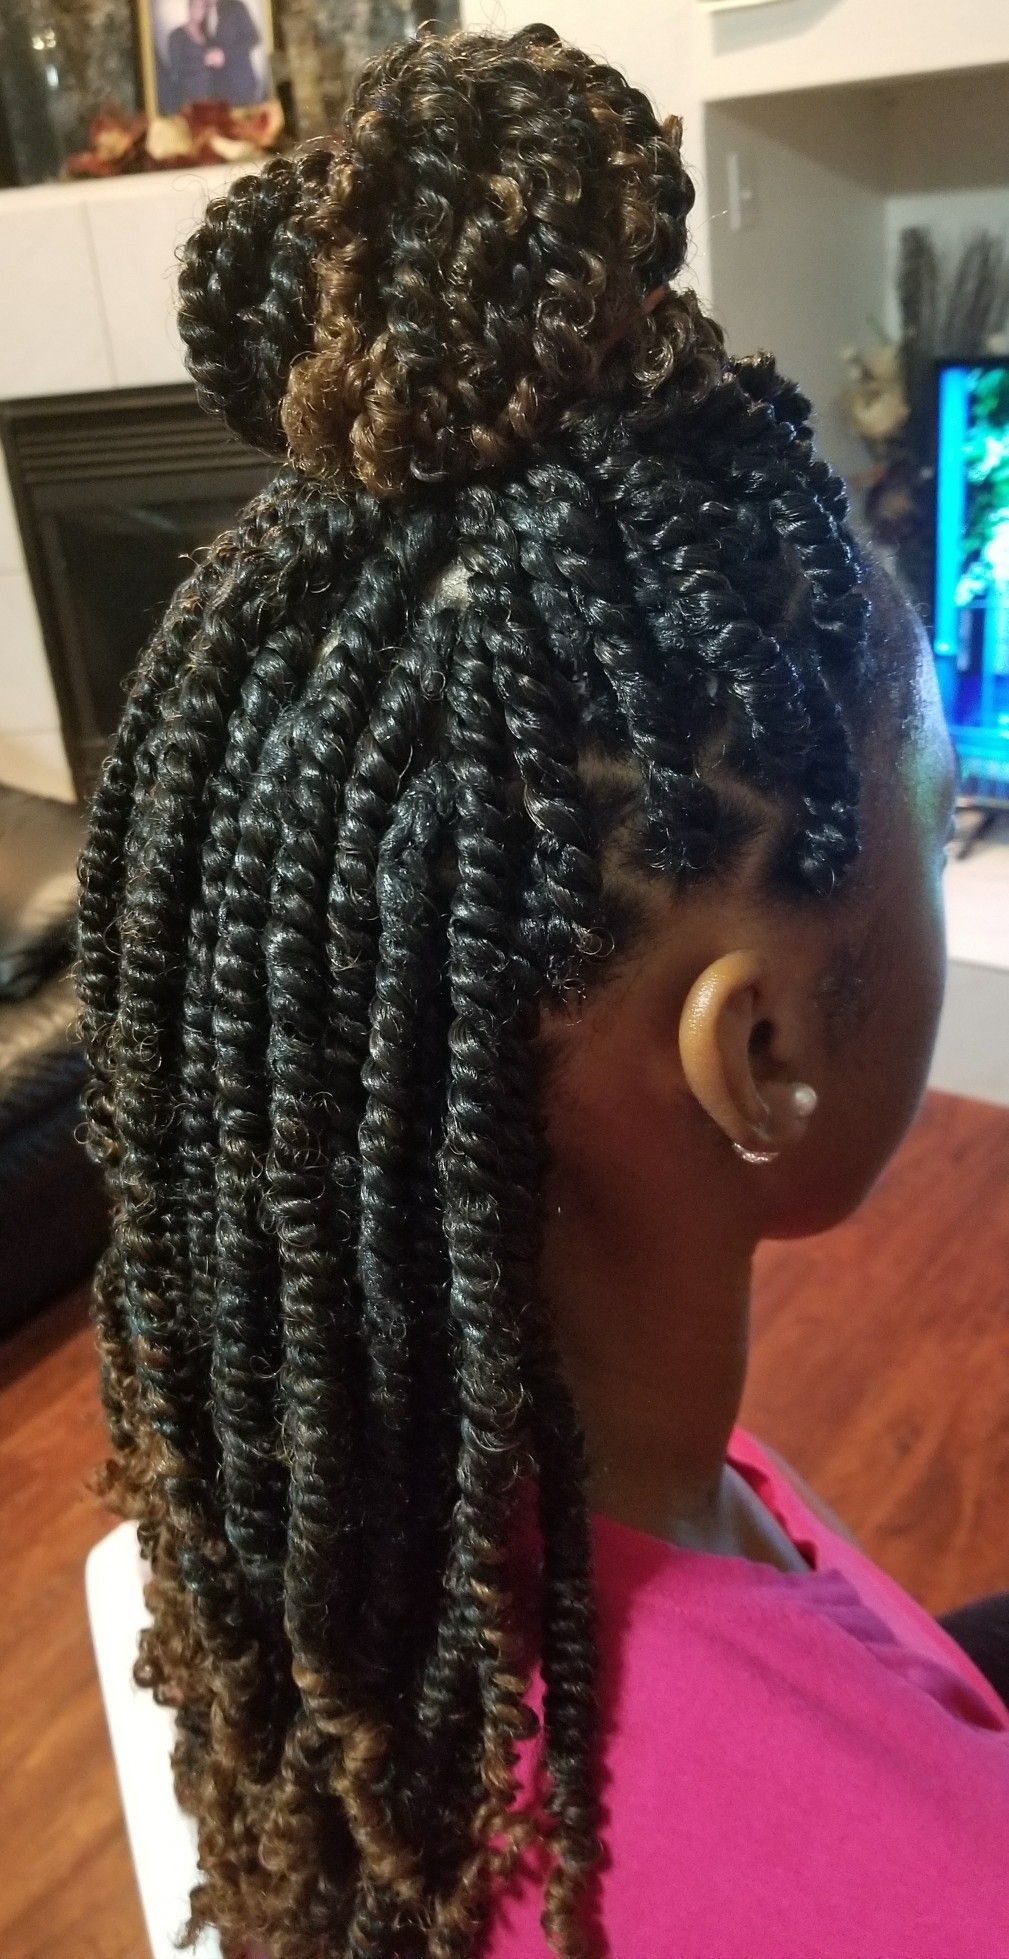 9/20/17 - finished my goddaughter jazmyne's hair!! #2pks of